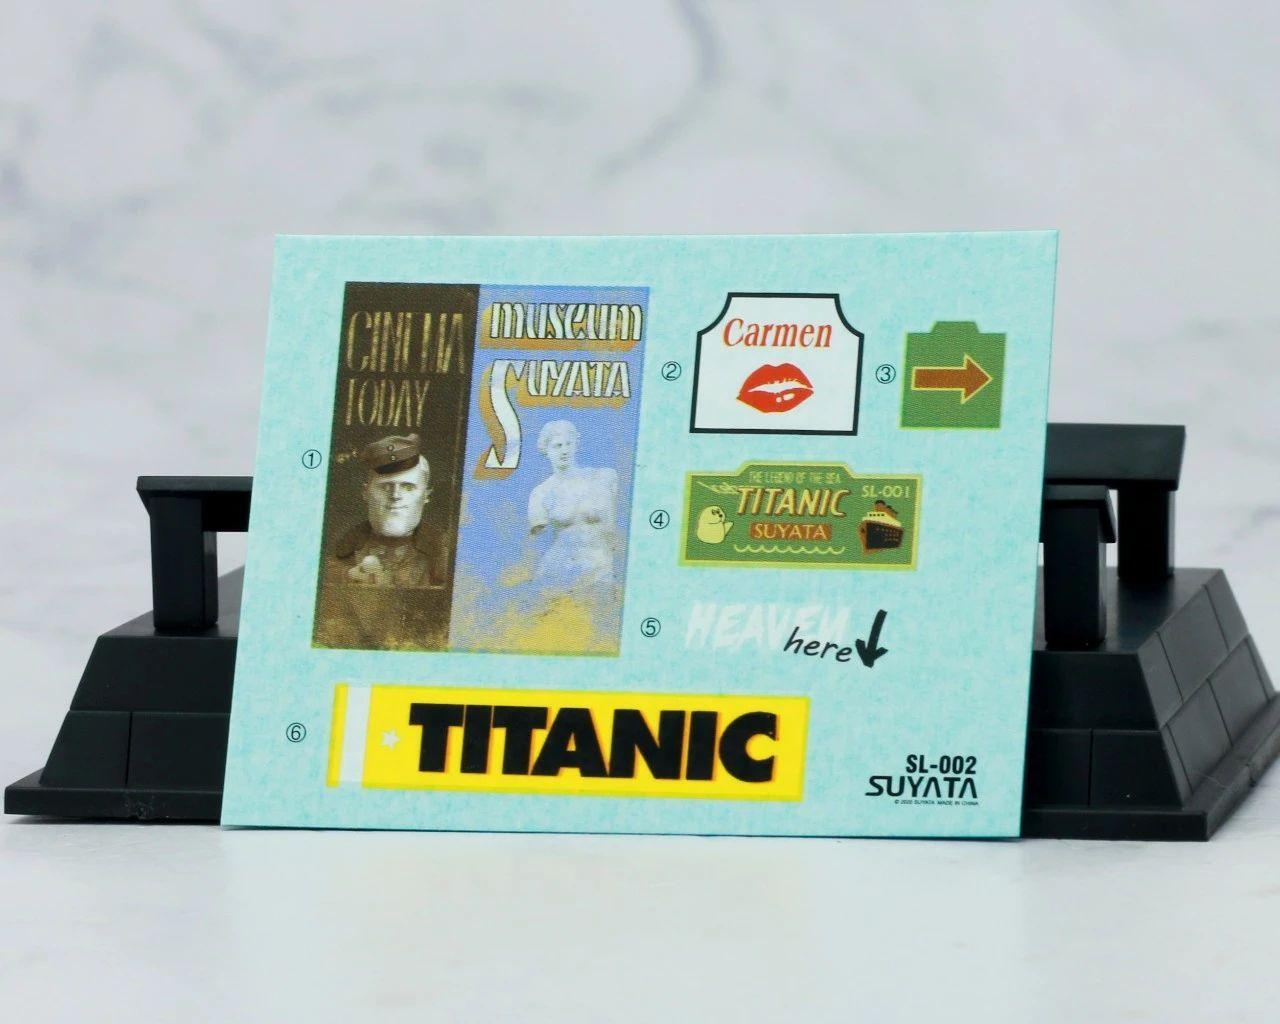 S484_1_2_RMS_Titanic_ice_SOUTHAMPTON_015.jpg